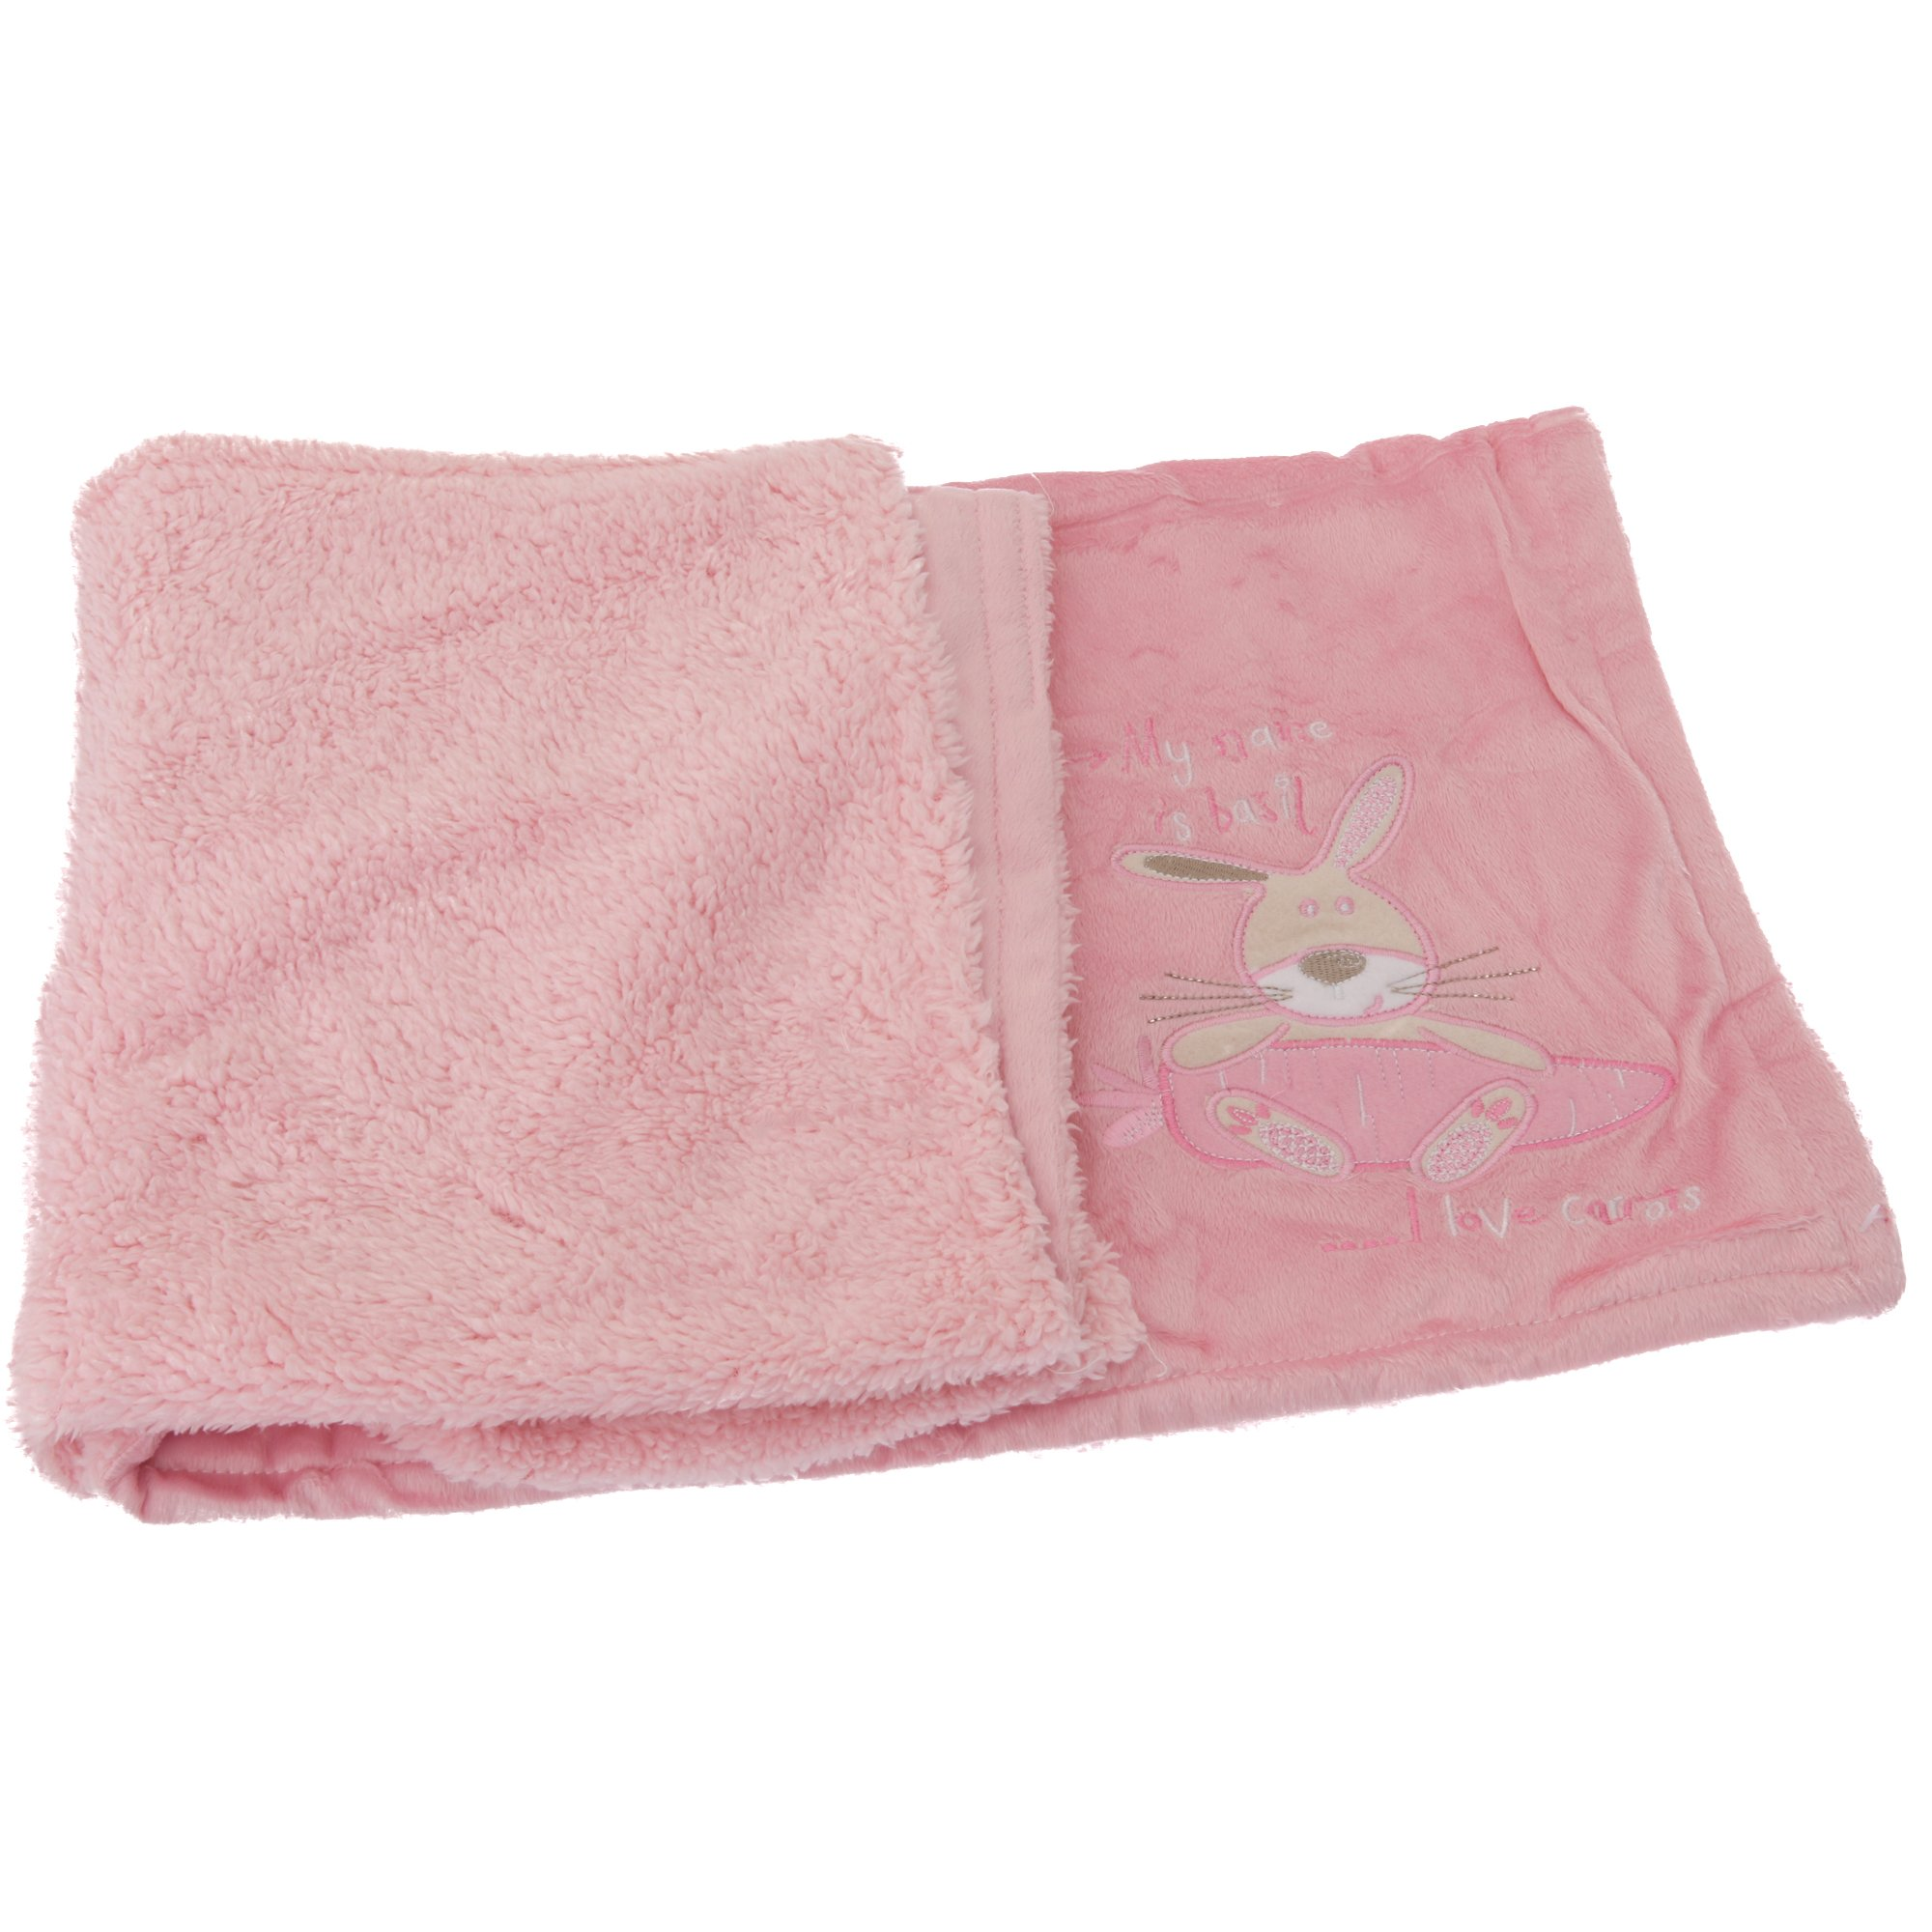 Baby Bunny Design Super Soft Fluffy Feel Pram Blanket | eBay